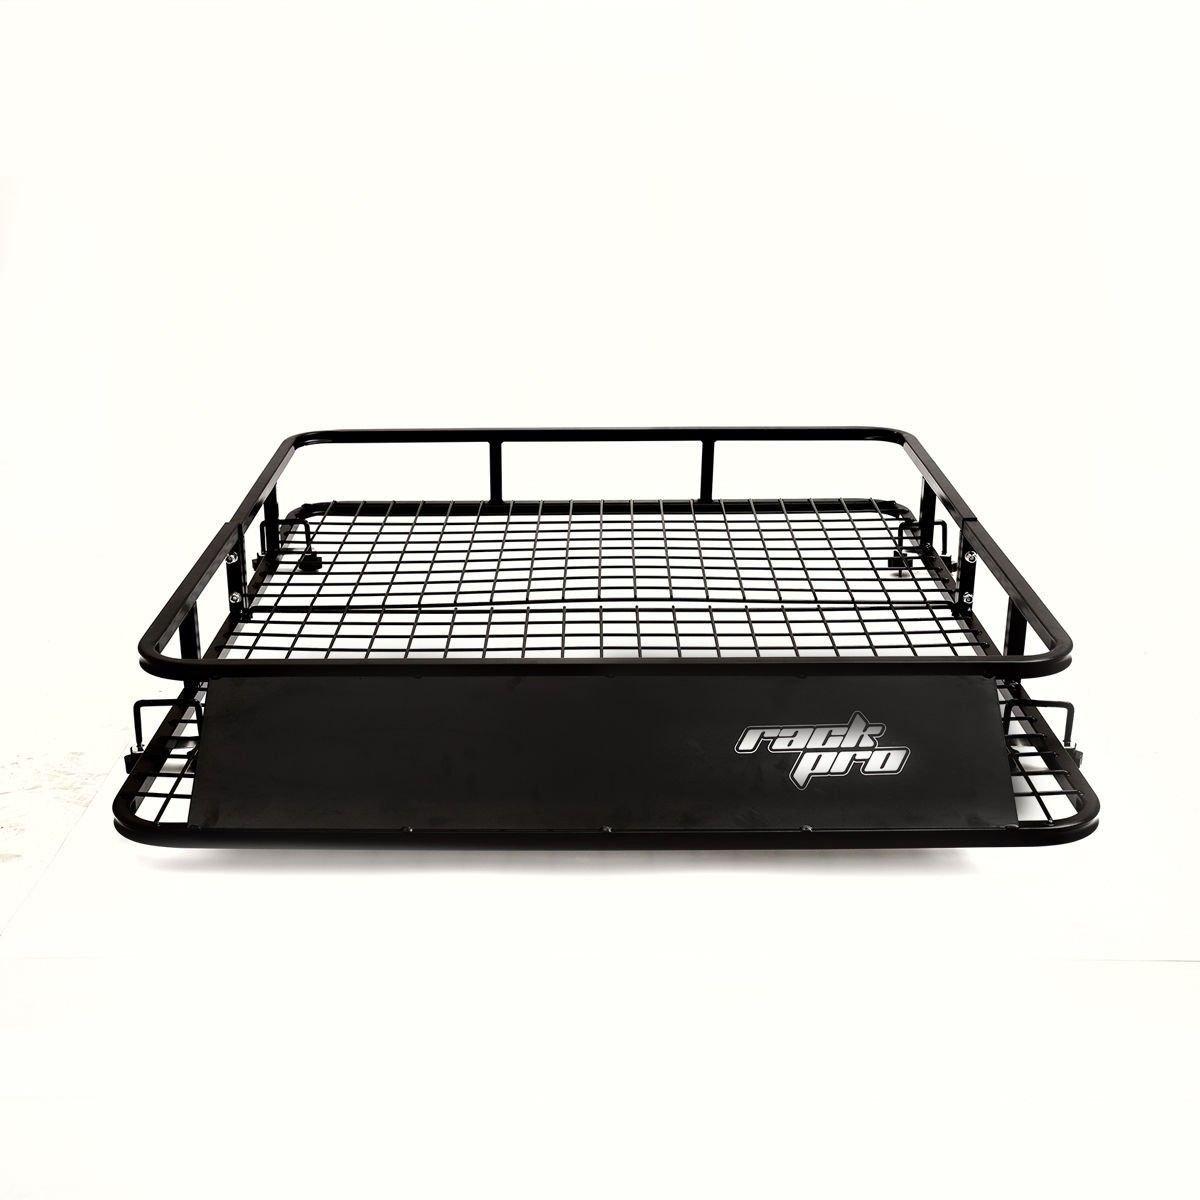 Universal Roof Rack Basket Car Top Luggage Carrier Cargo Holder Travel 48 x 40